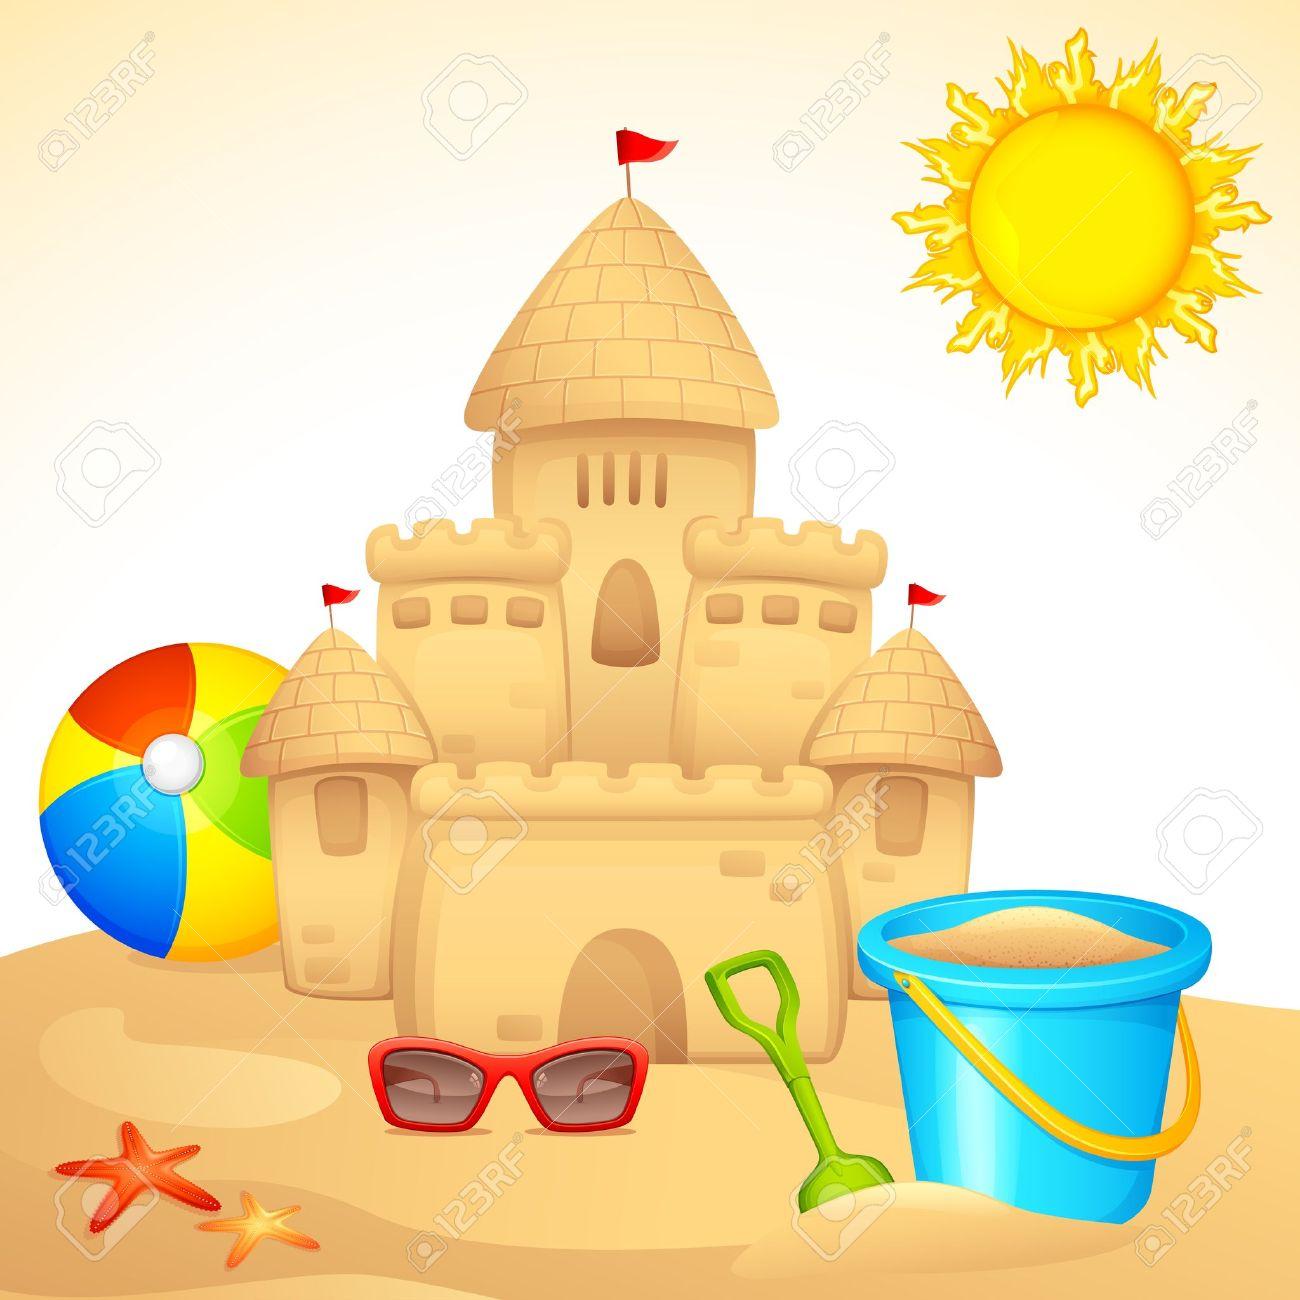 Cute Sand Castle Clip Art ... 0a35e718f758f785f77669ce251e7c .